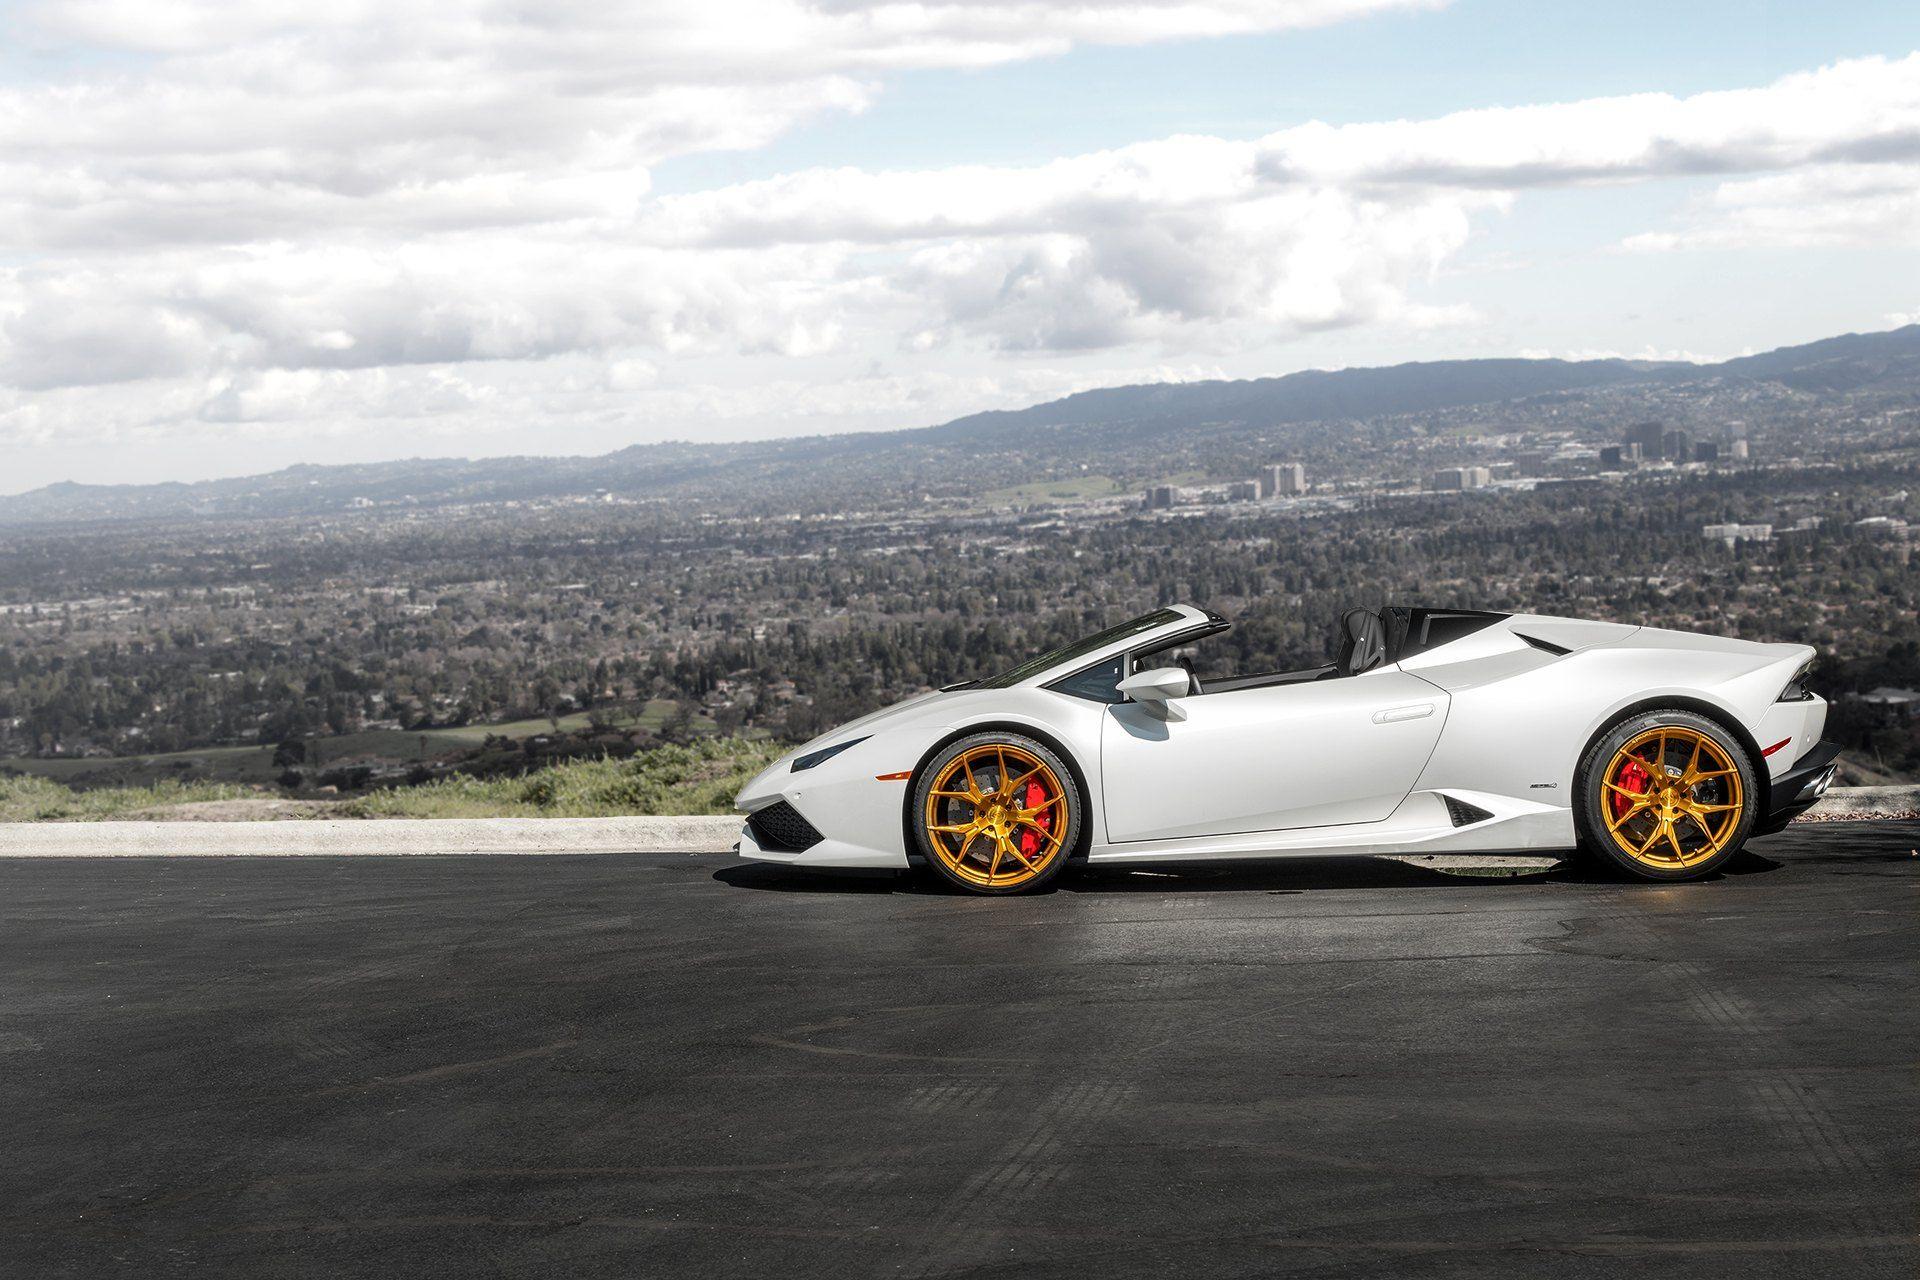 Double Luxury White Lamborghini Huracan On Gold Wheels Car